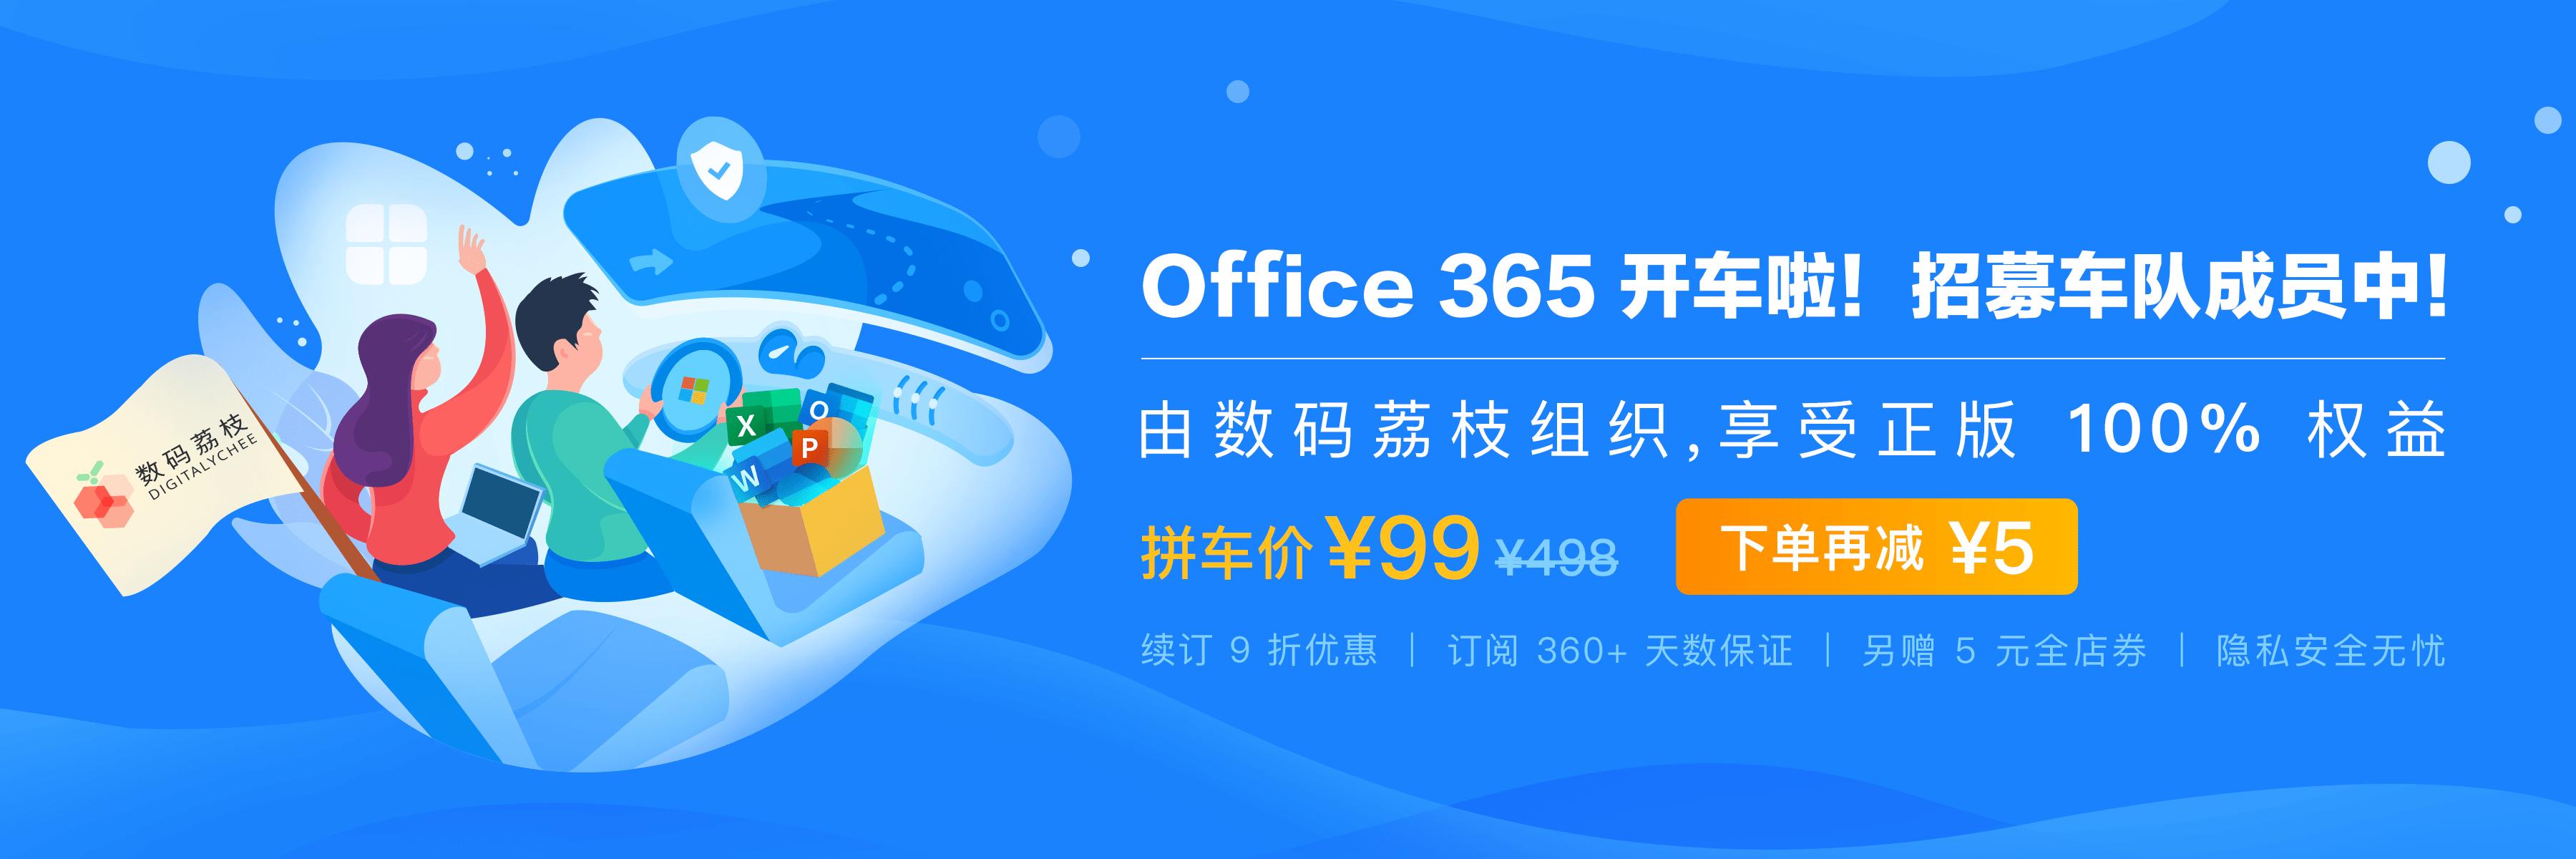 Office 365 家庭版共享版,99 元/年/席位